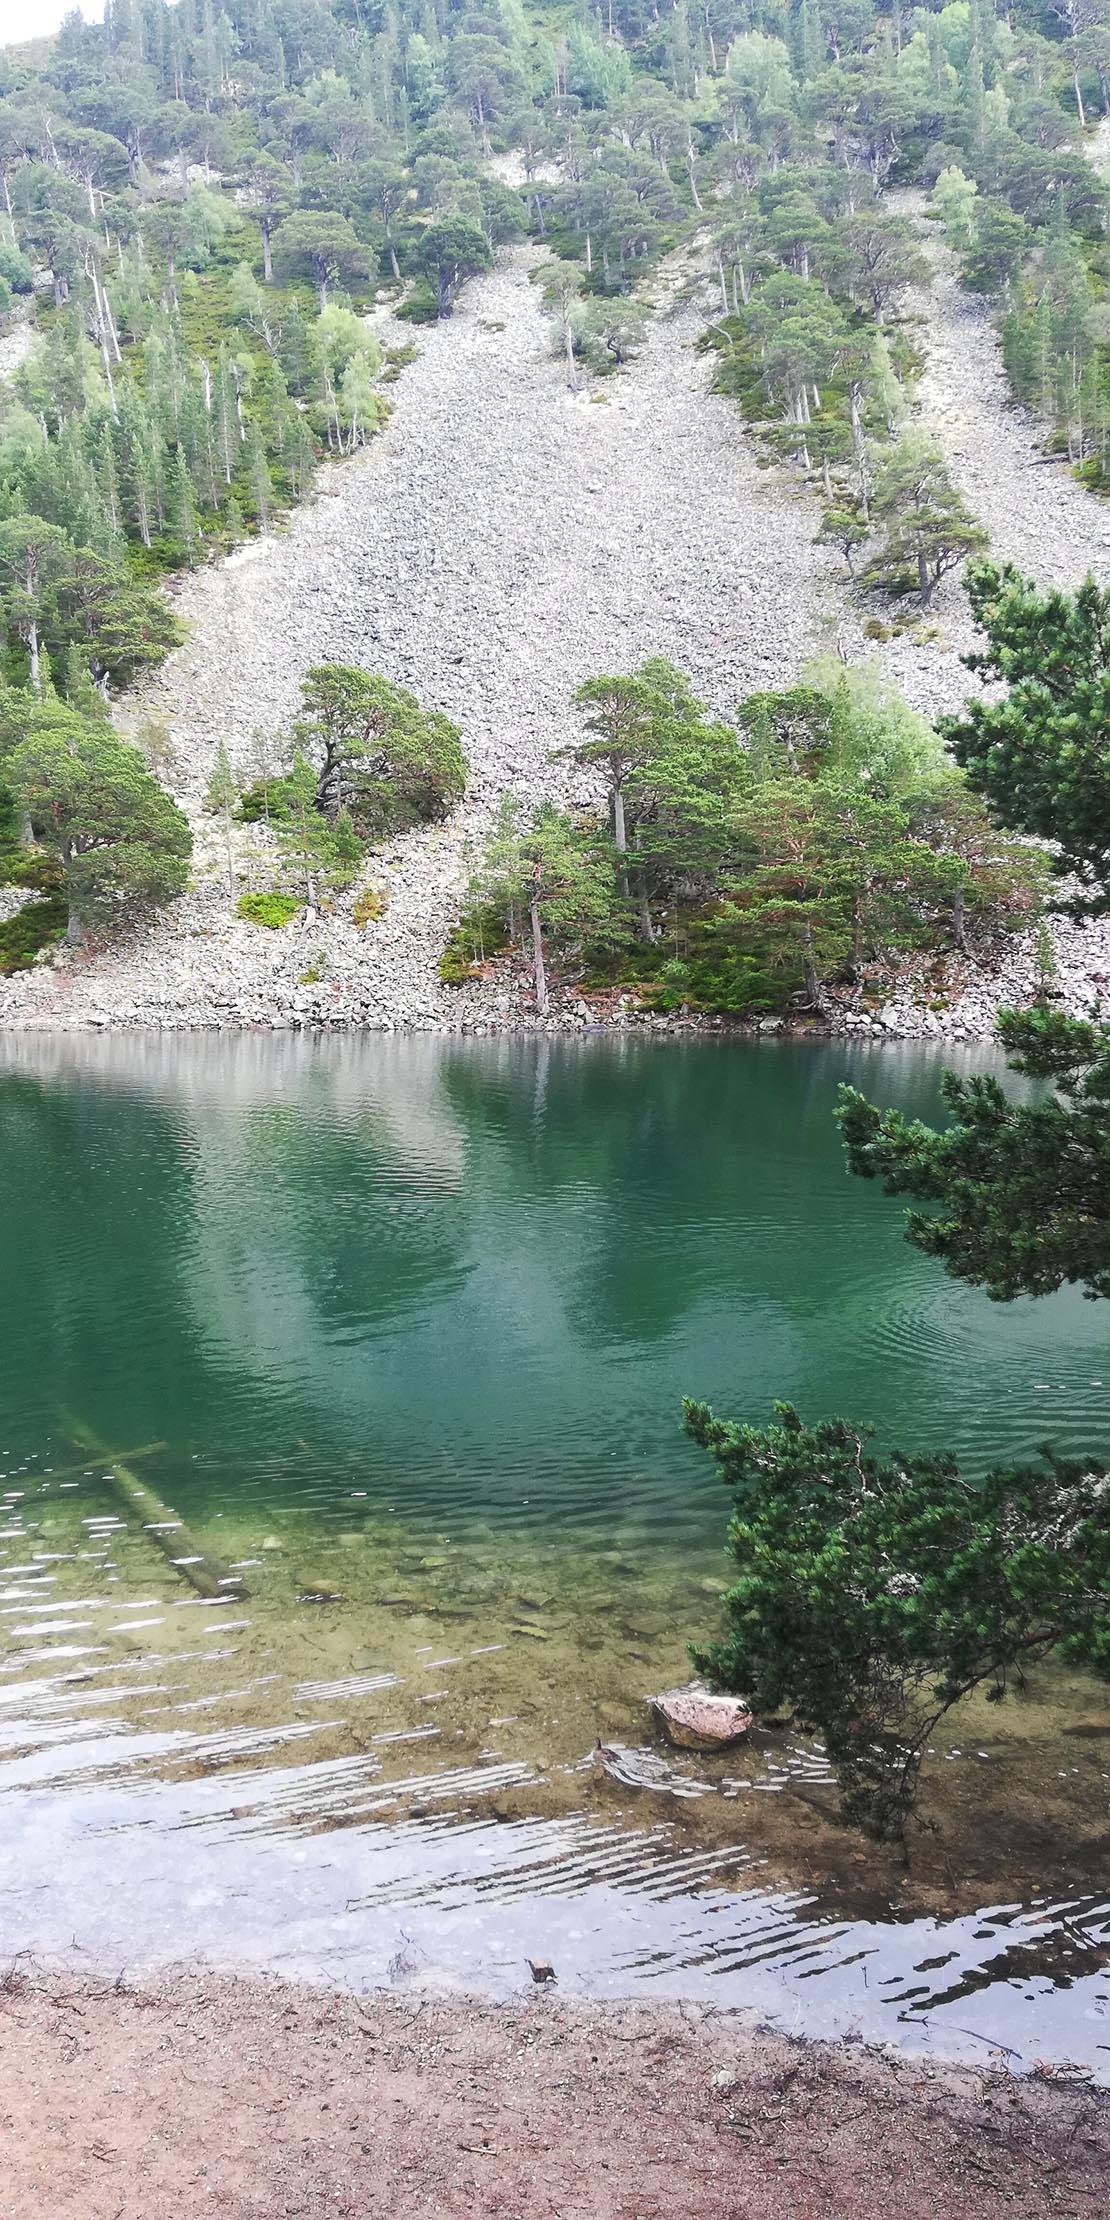 An Lochan Uaine - The Green Loch